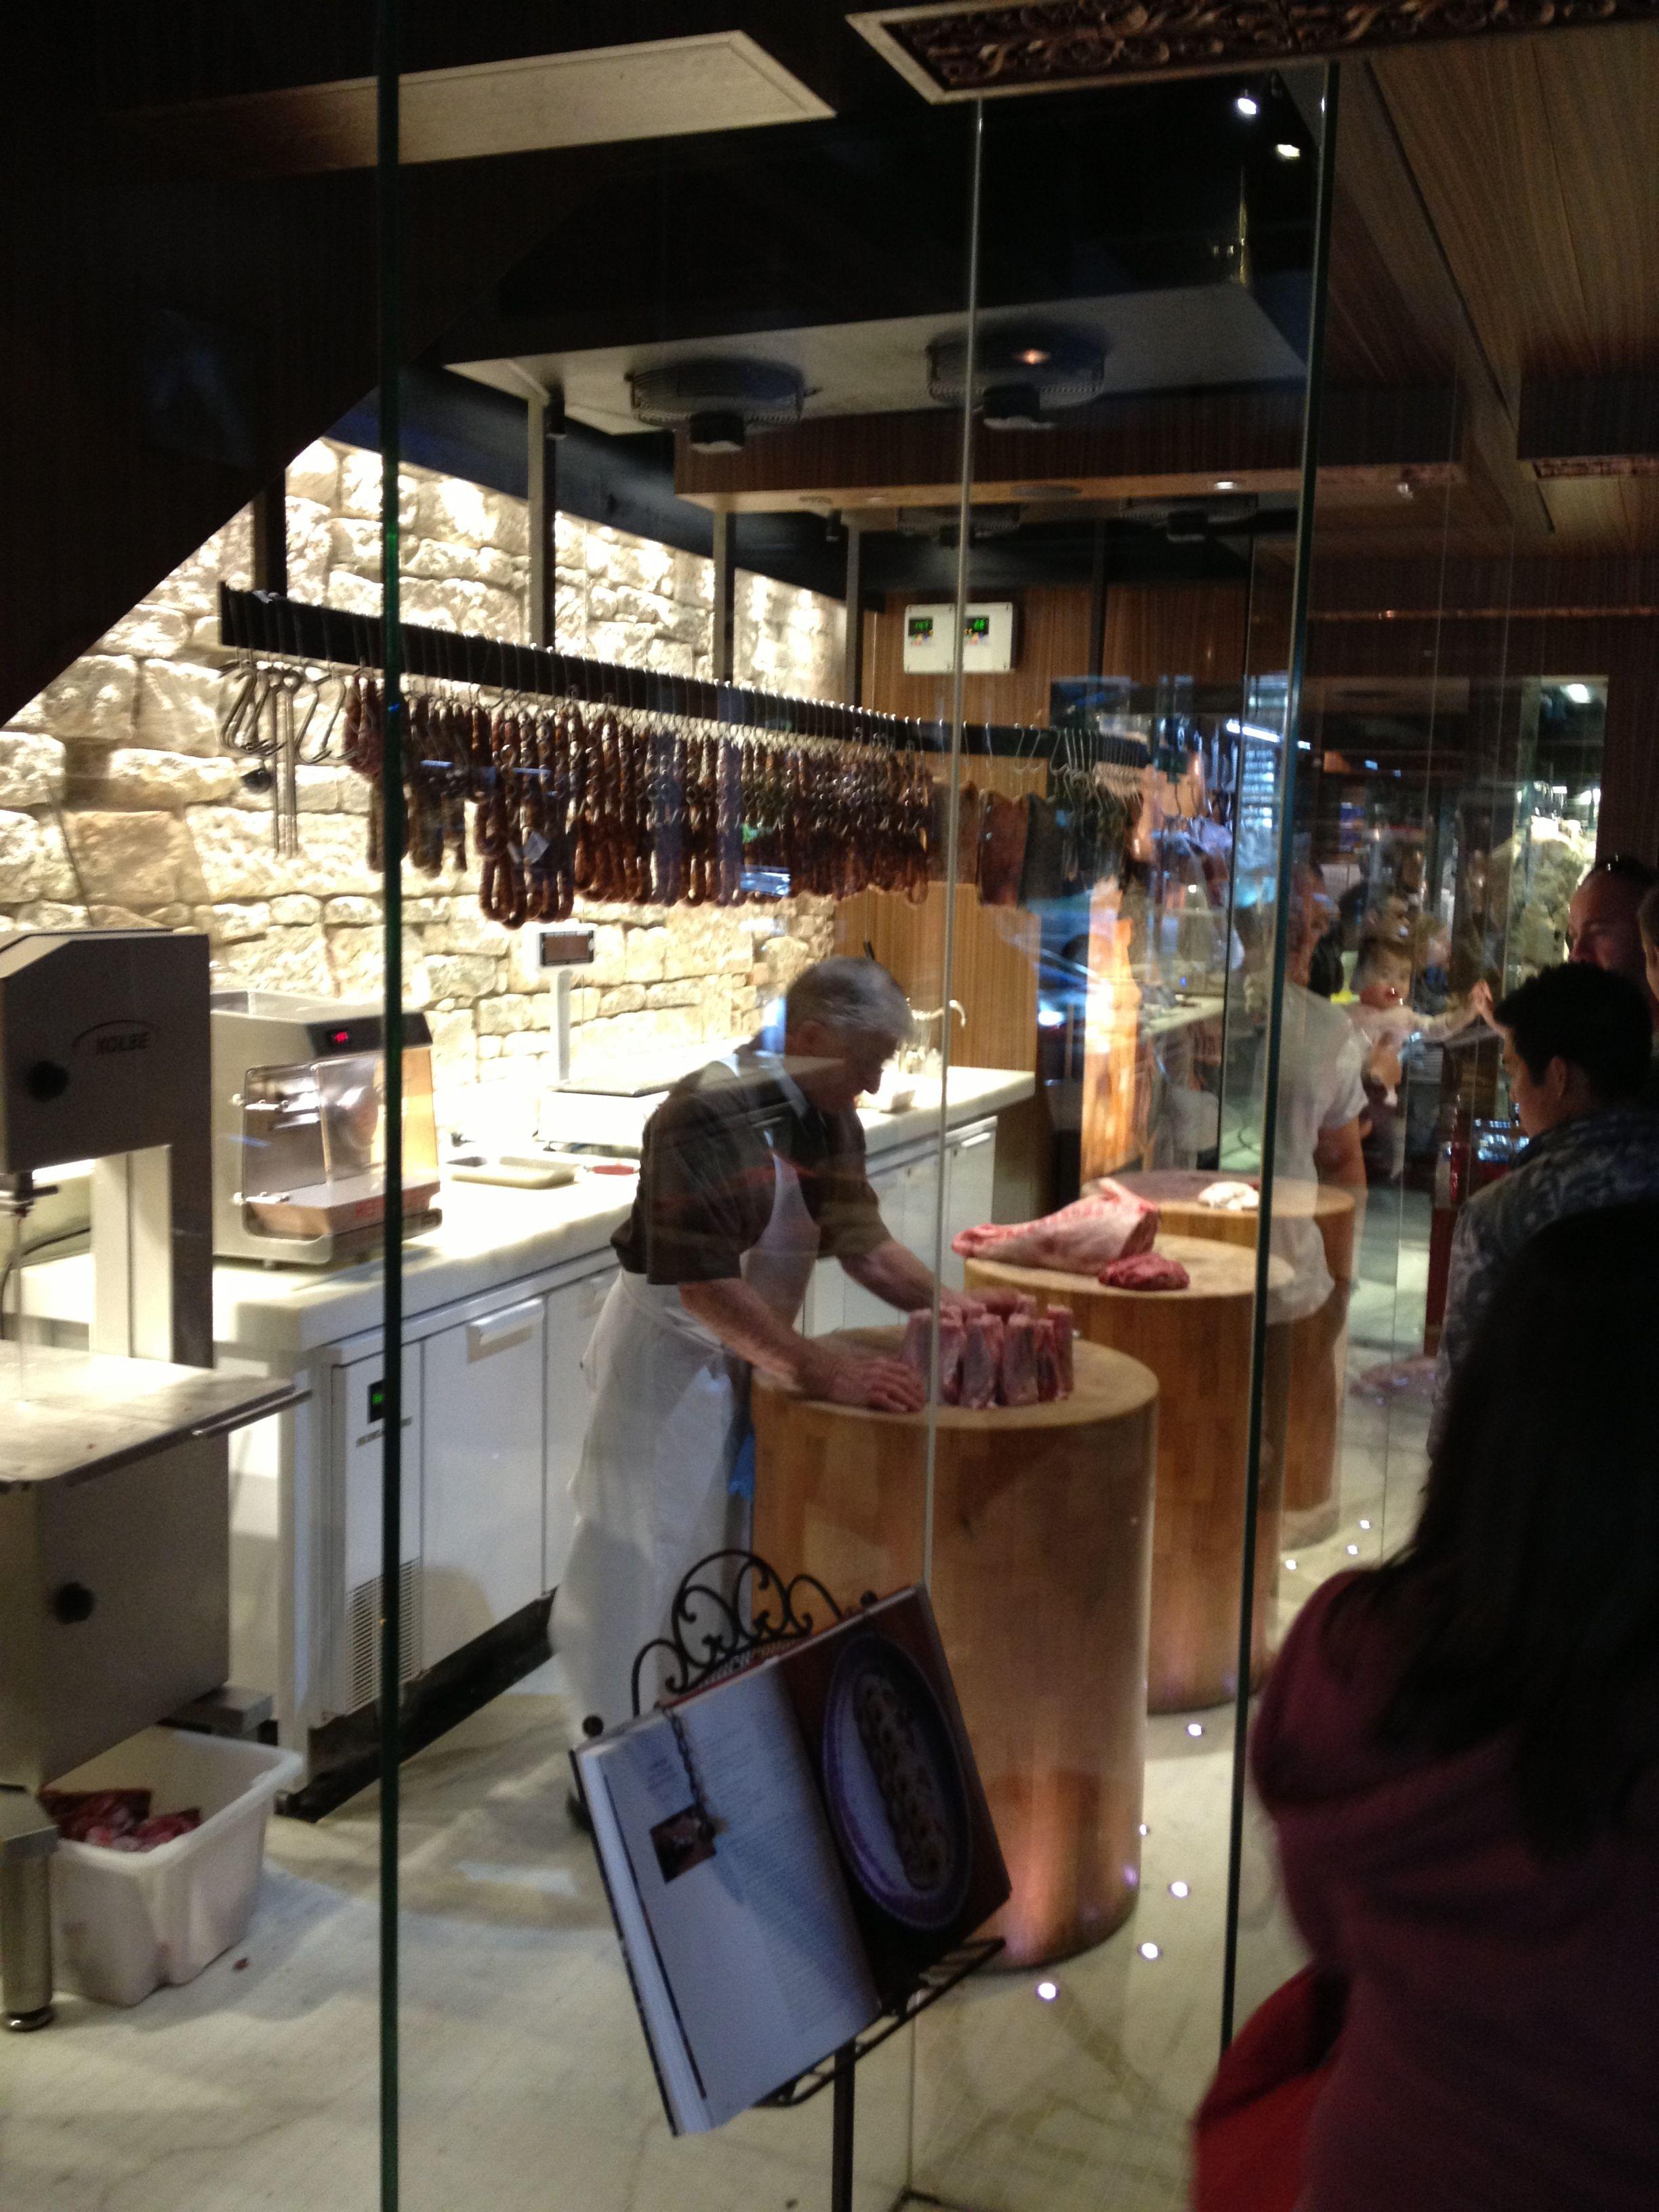 Kitchen Of Butchery : Victor Churchill, Sydney - take a butchers! Butchery in 2019 Carnicer?a, Charcuteria ...